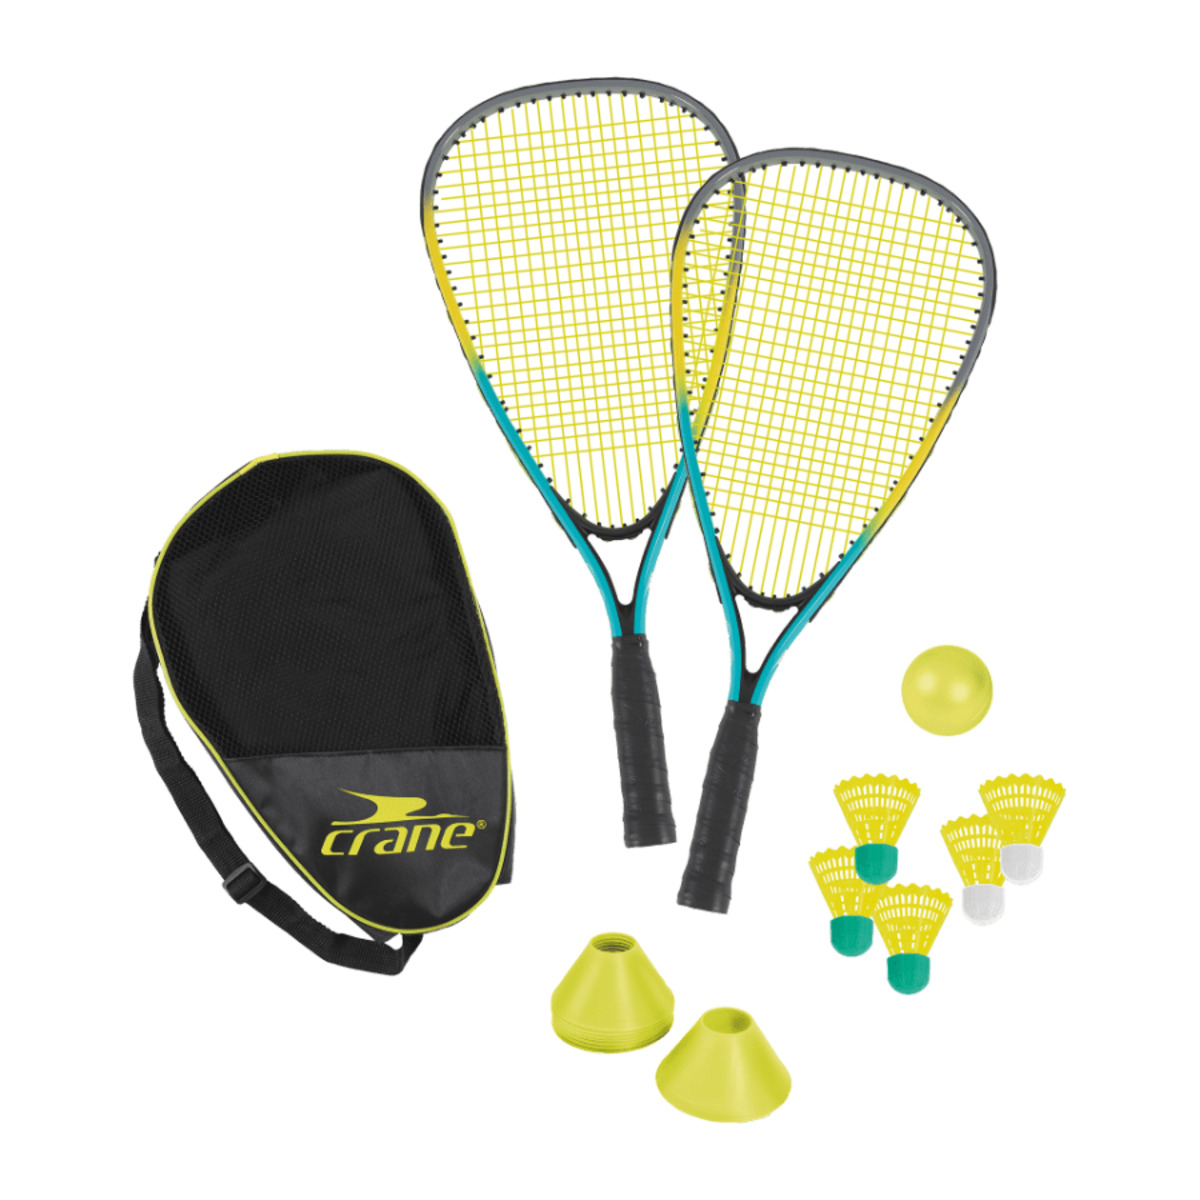 Bild 4 von CRANE     Turbo-Badminton-Set